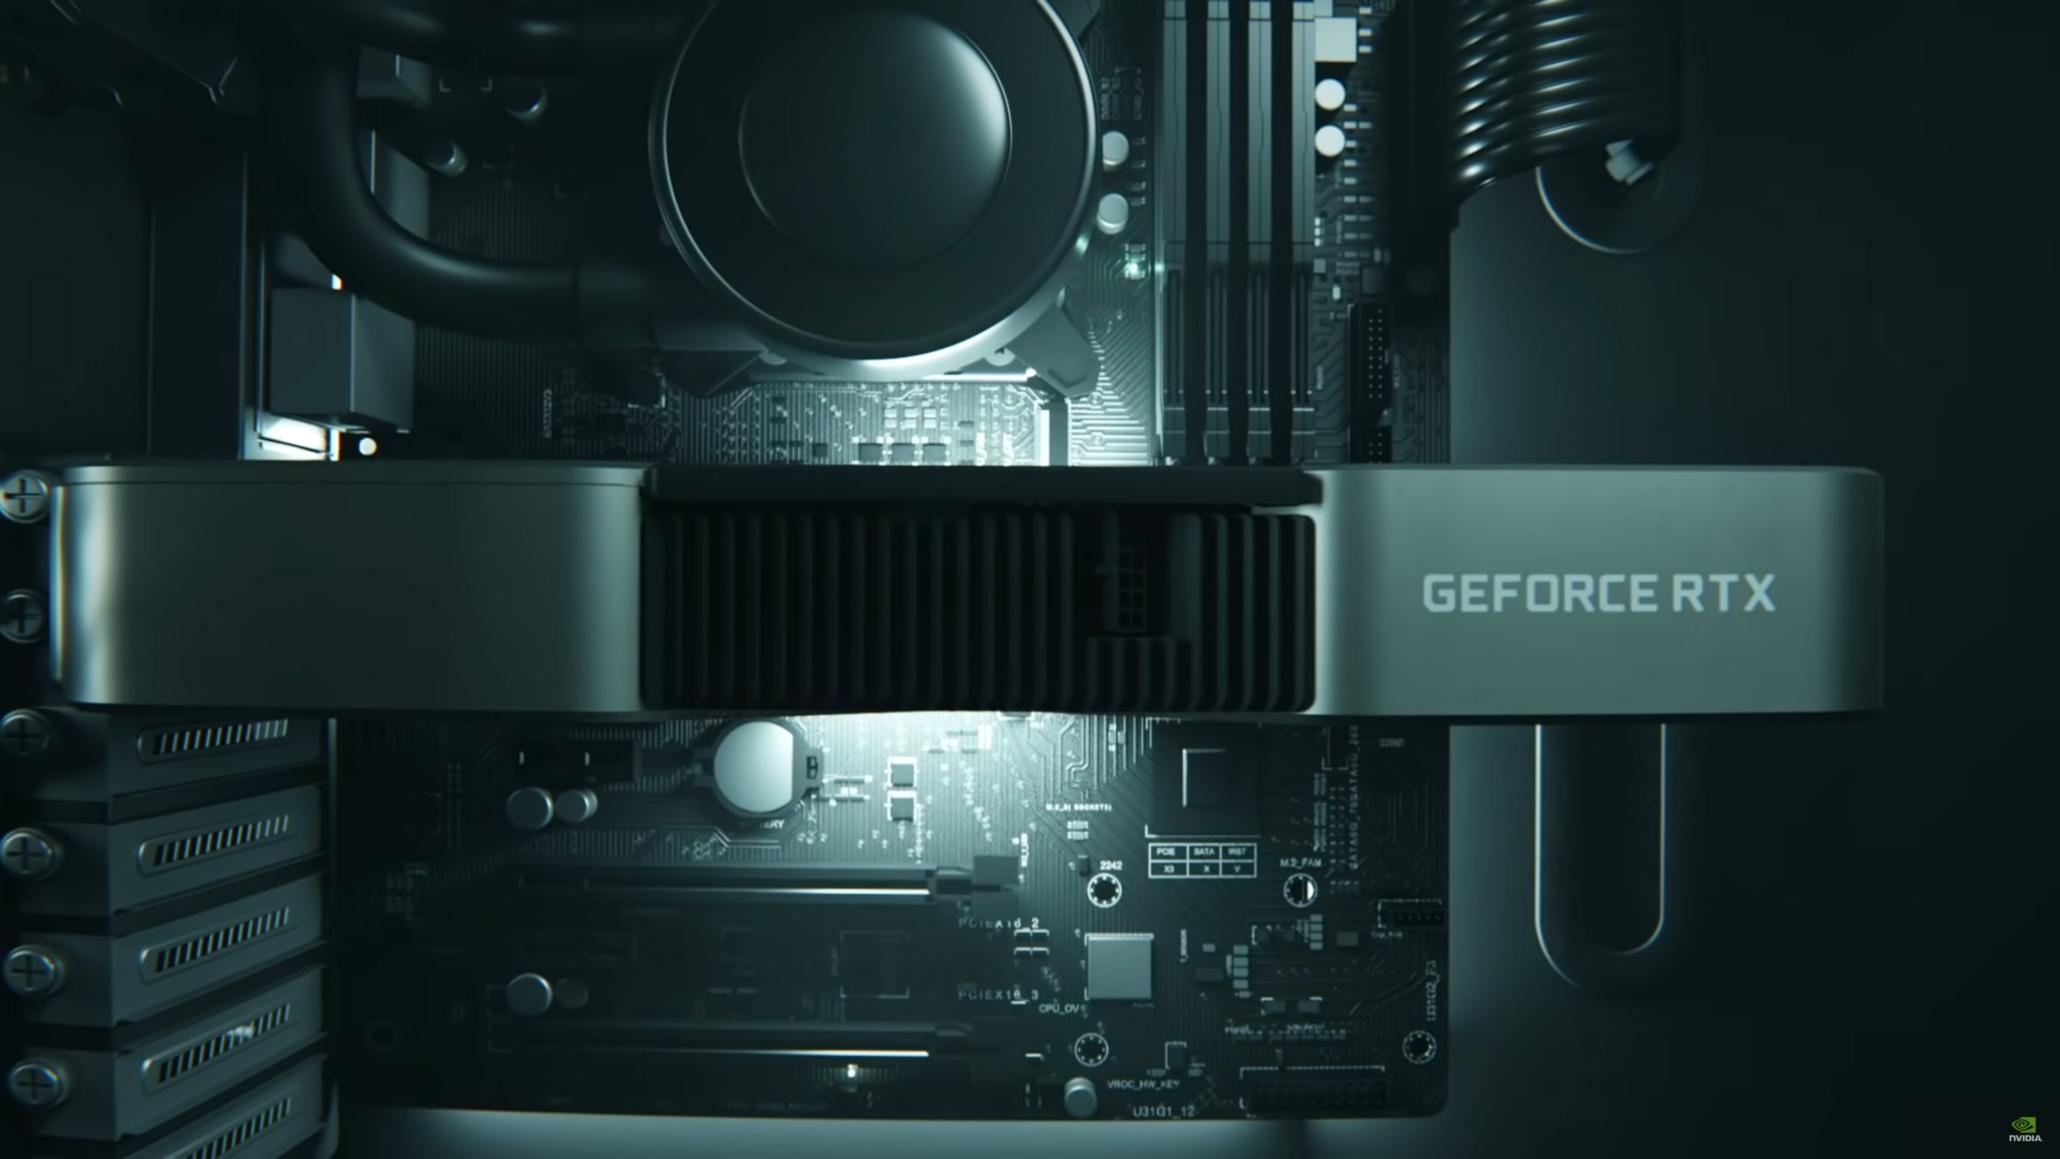 NVIDIA GeForce RTX 3060 Ti Official Performance Benchmarks Bocor, Lebih Cepat dari RTX 2080 SUPER dalam Gaming, Ray Tracing & Creation